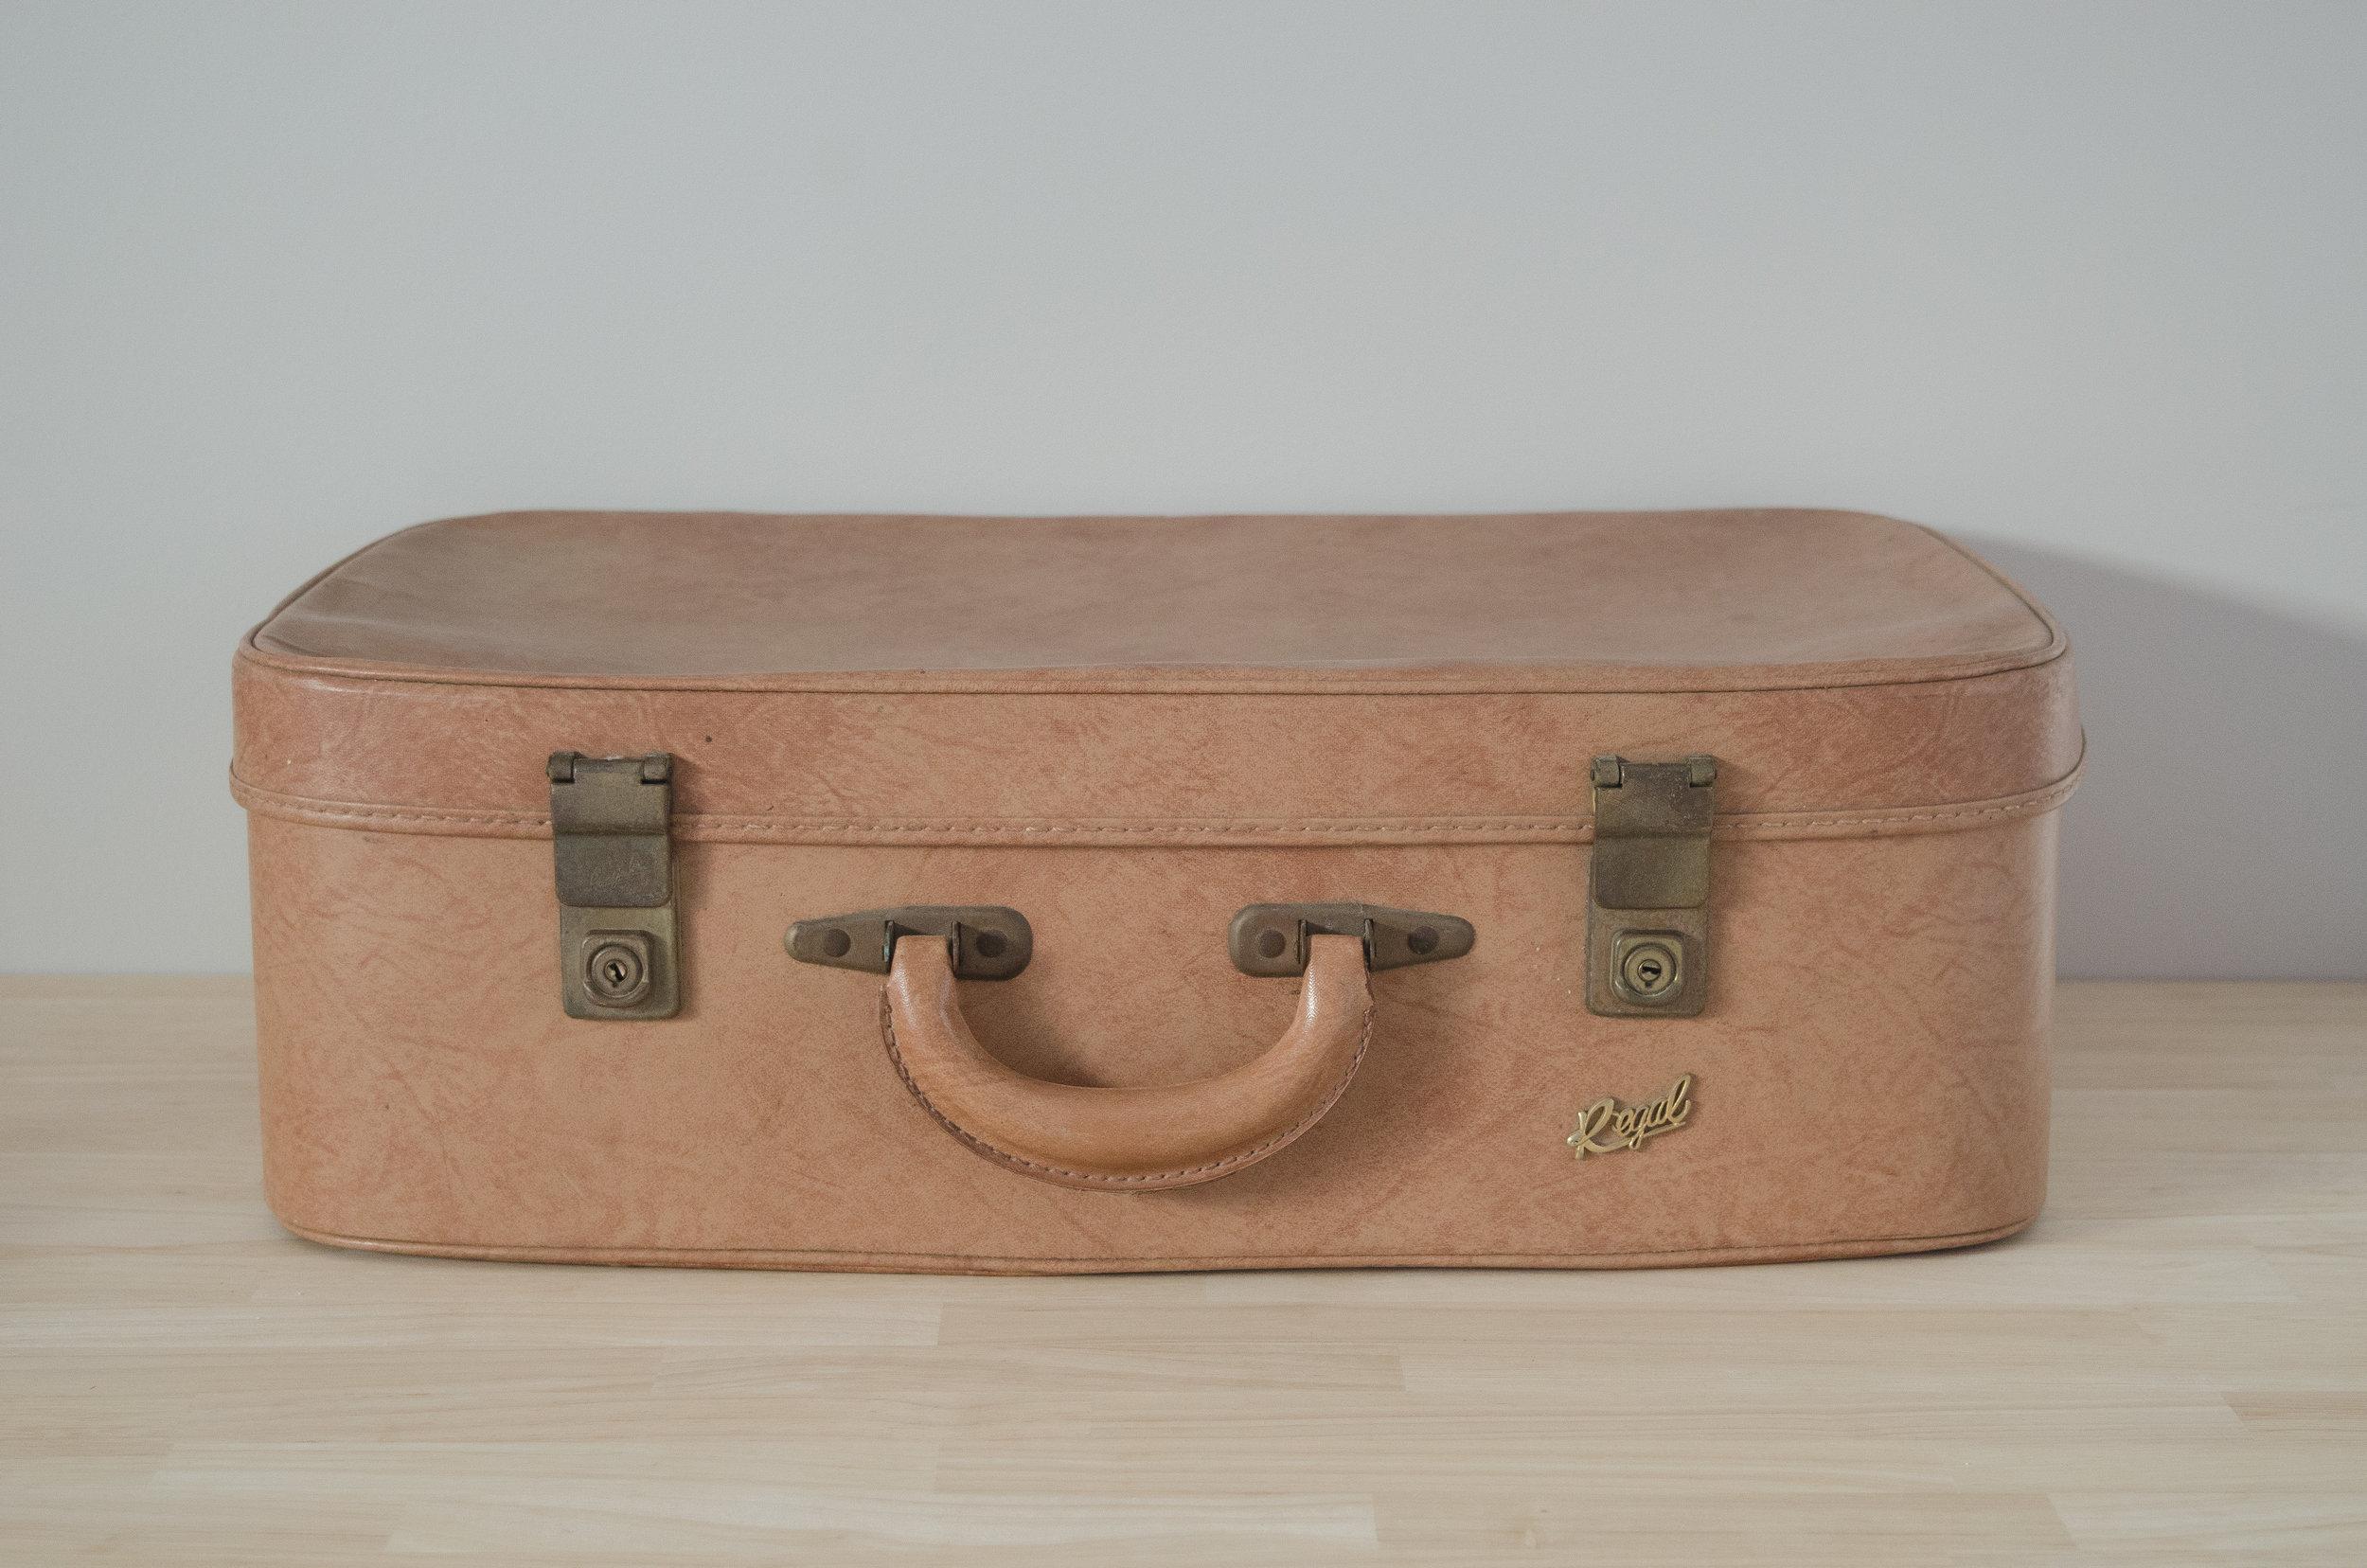 Caramel Suitcase - LARGE    $10.00 (3-day Hire)                                                  Quantity: 1